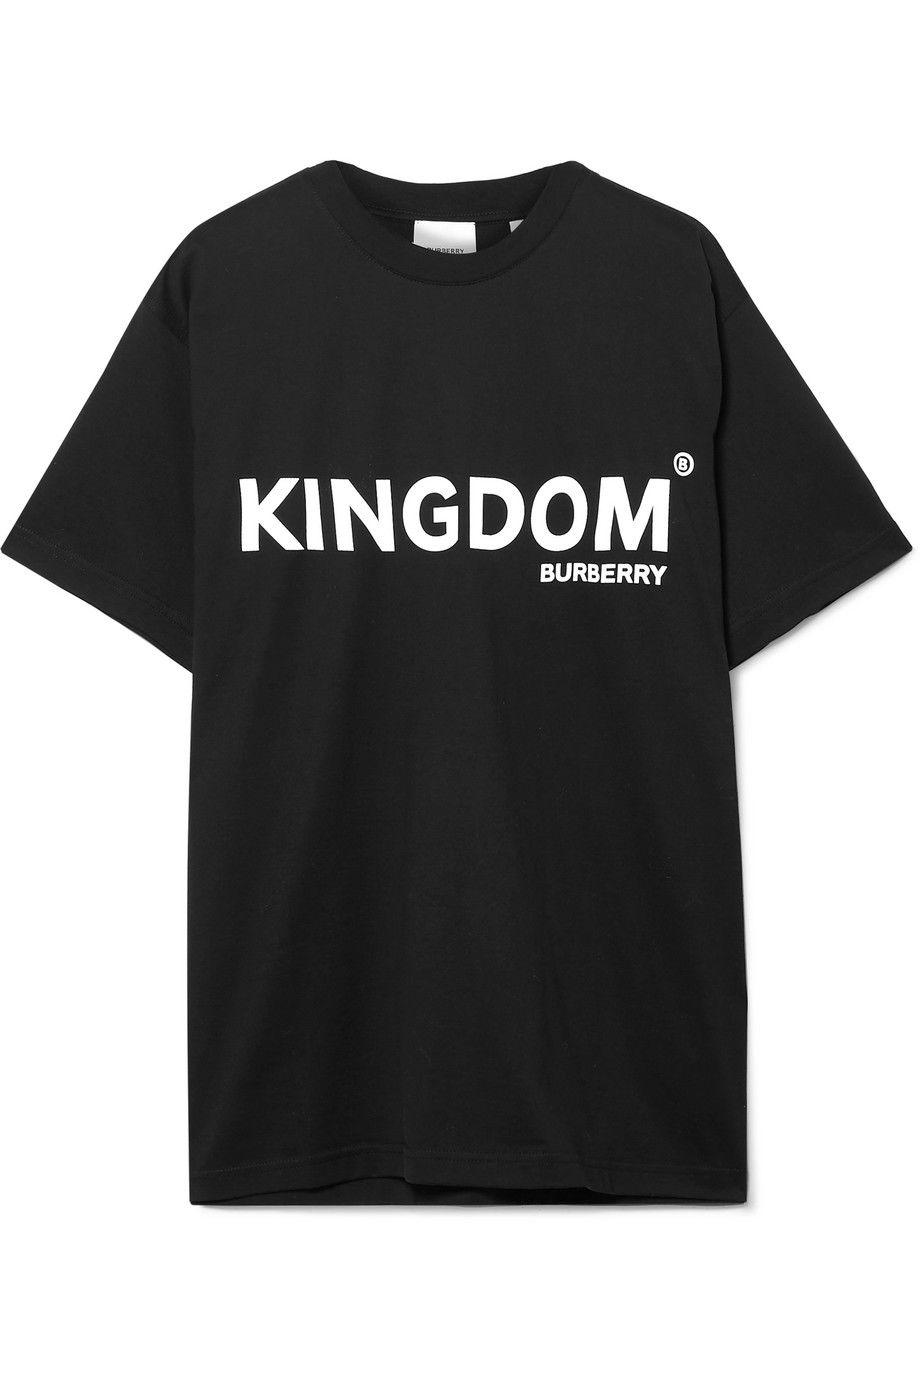 #PopbelaOOTD: T-shirt Desainer untuk Gaya Kasual